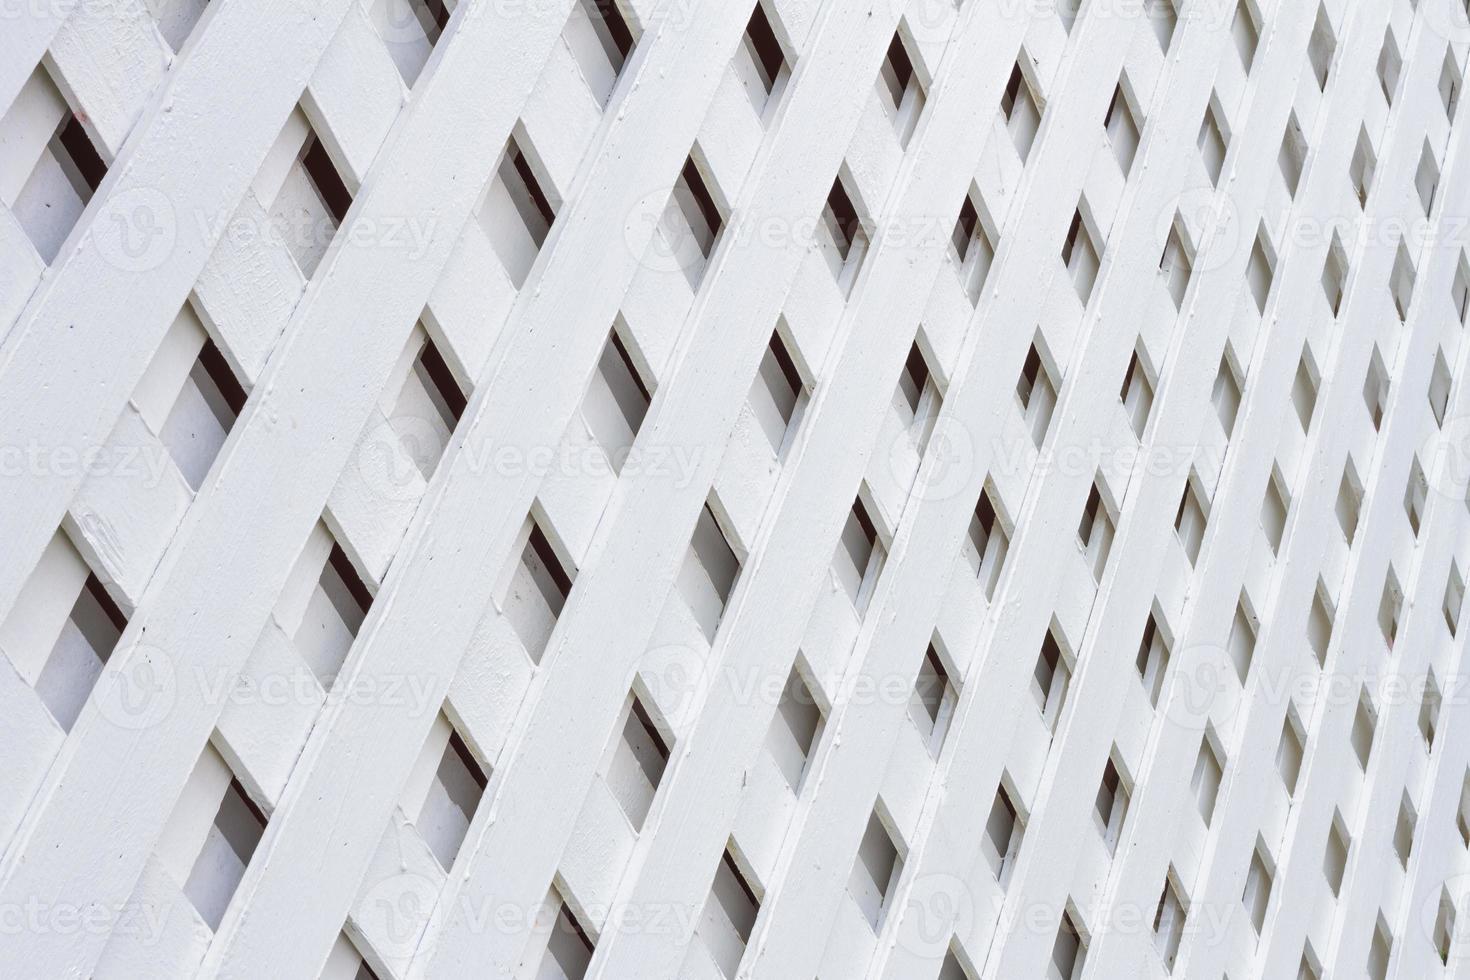 pared de madera blanca foto